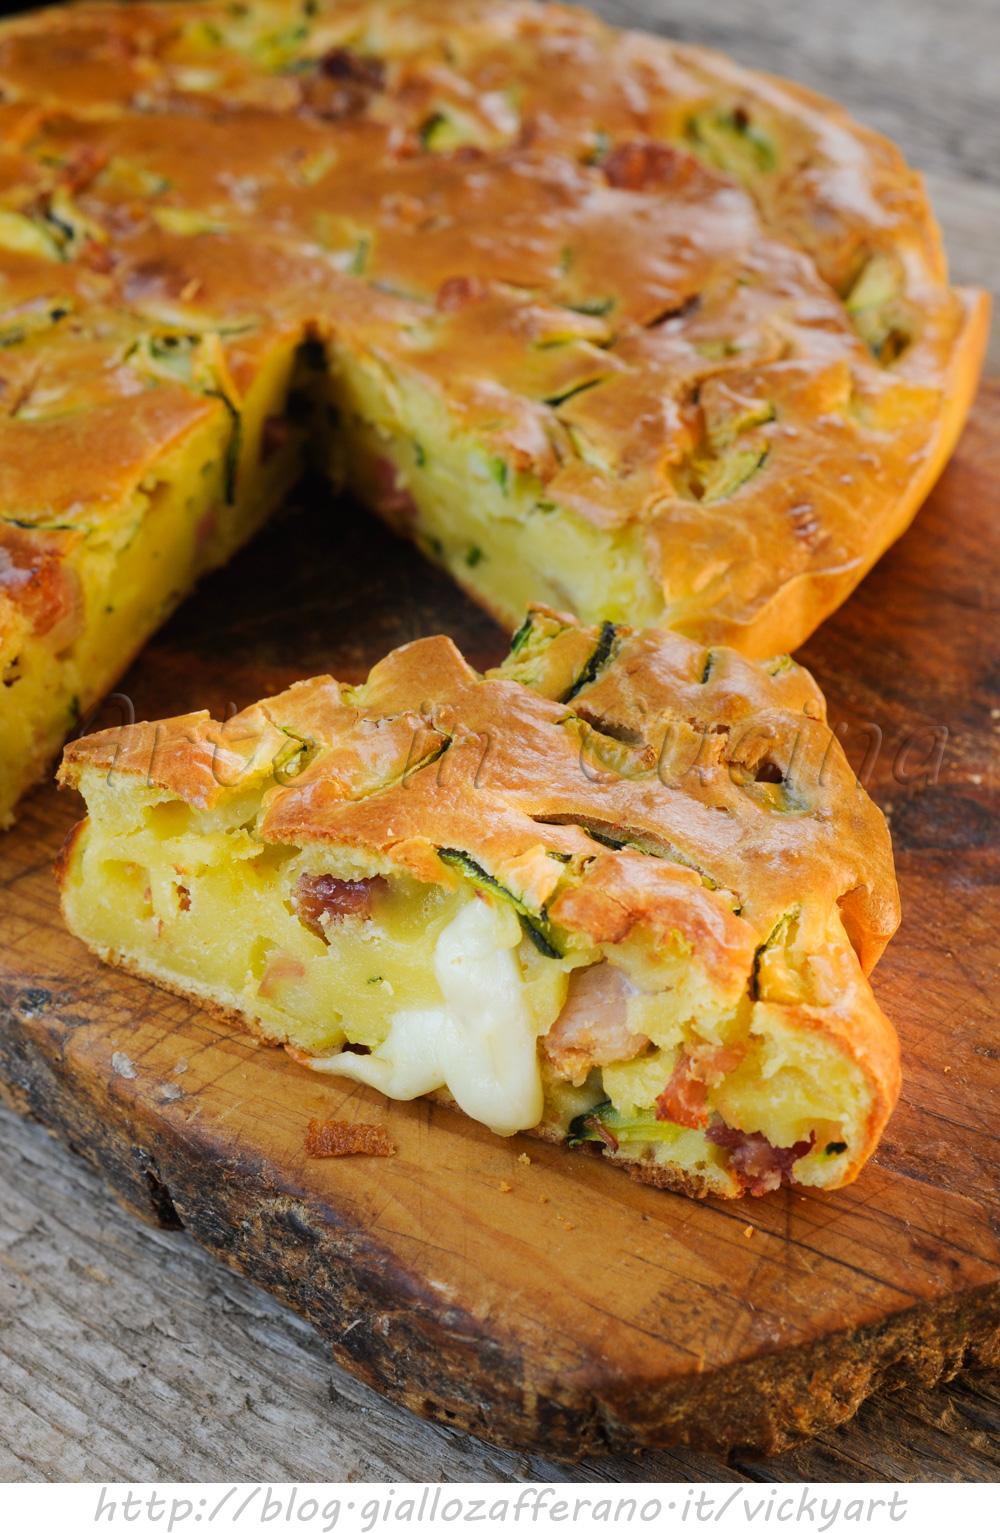 Torta con zucchine e salumi ricetta salata veloce vickyart arte in cucina